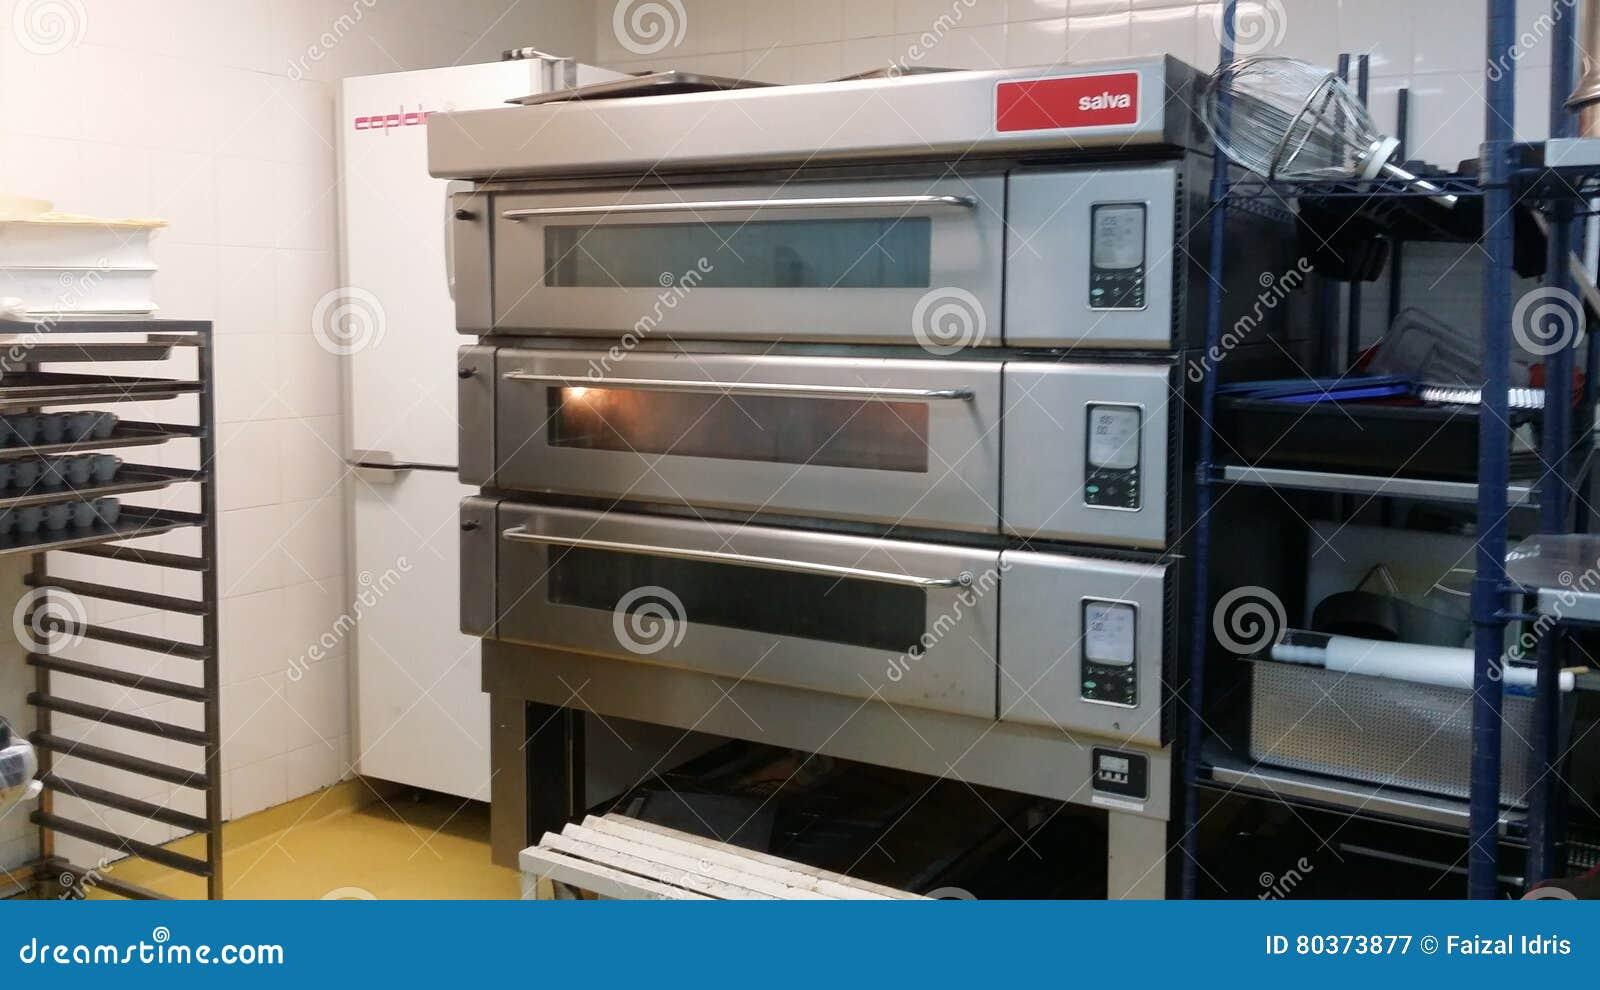 Modern Kitchen Equipment 11th nov 2016, kuala lumpur.the modern hotel kitchen equipment